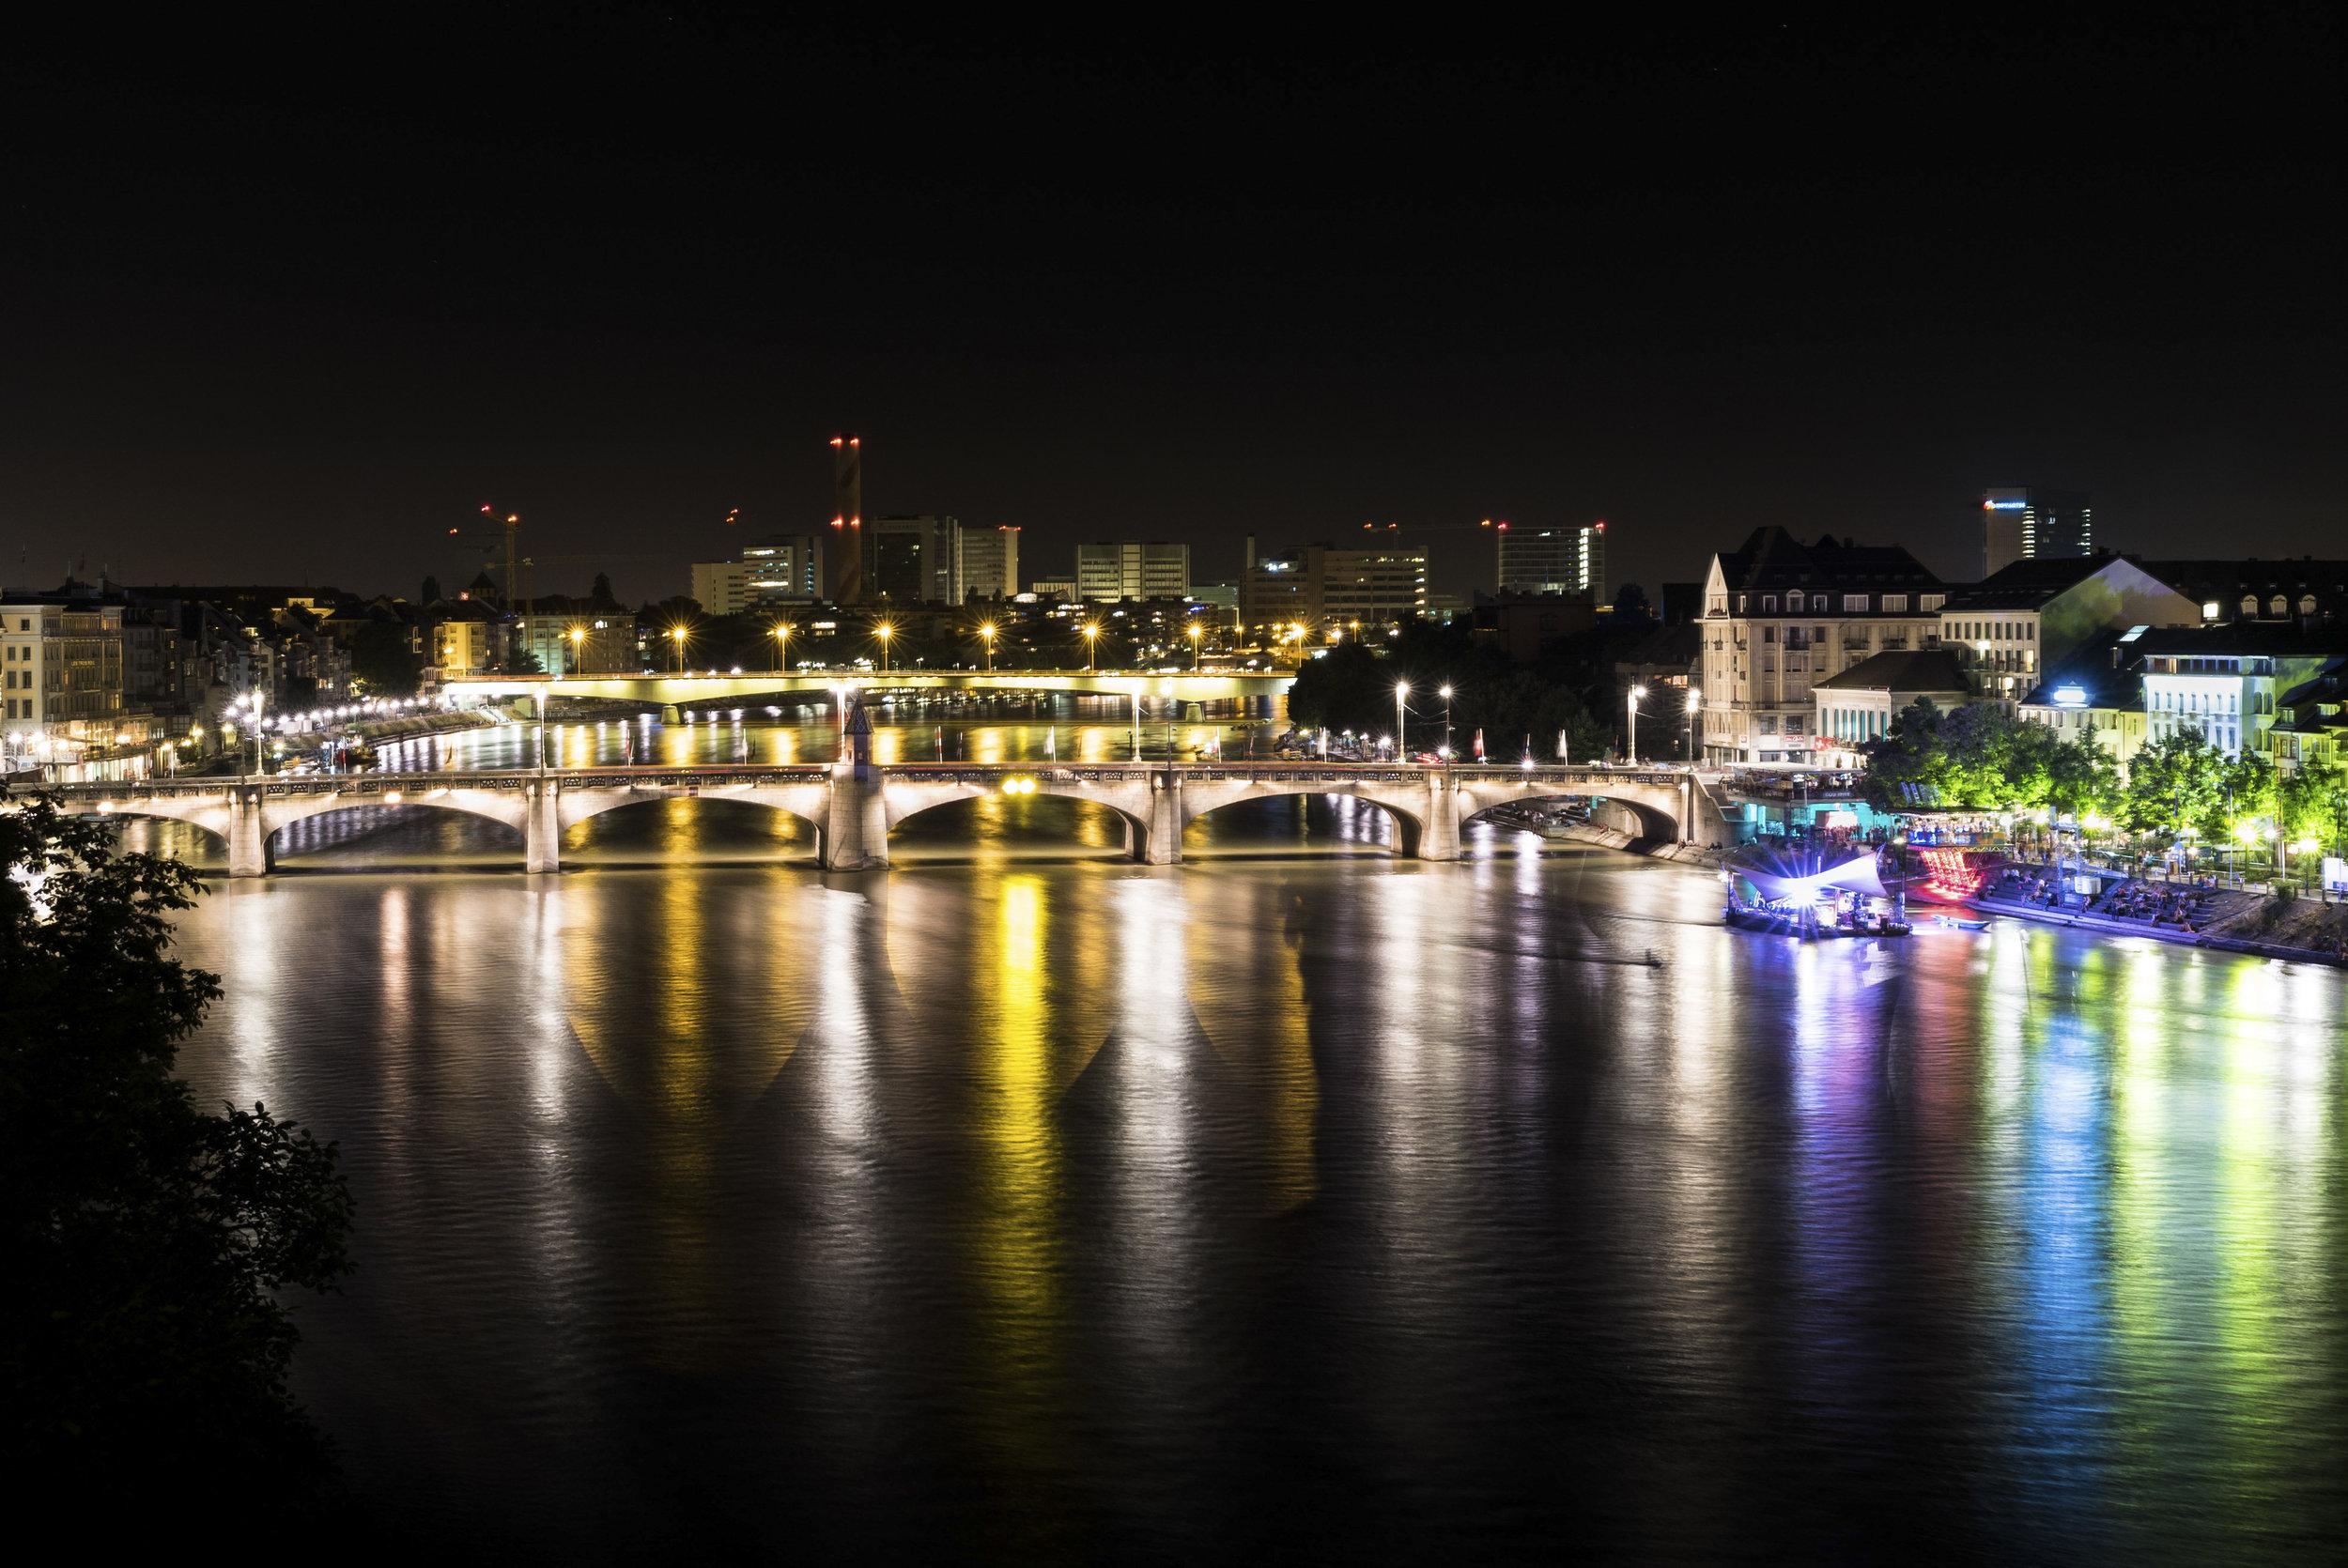 Mittlere Brücke Basel at night - Switzerland